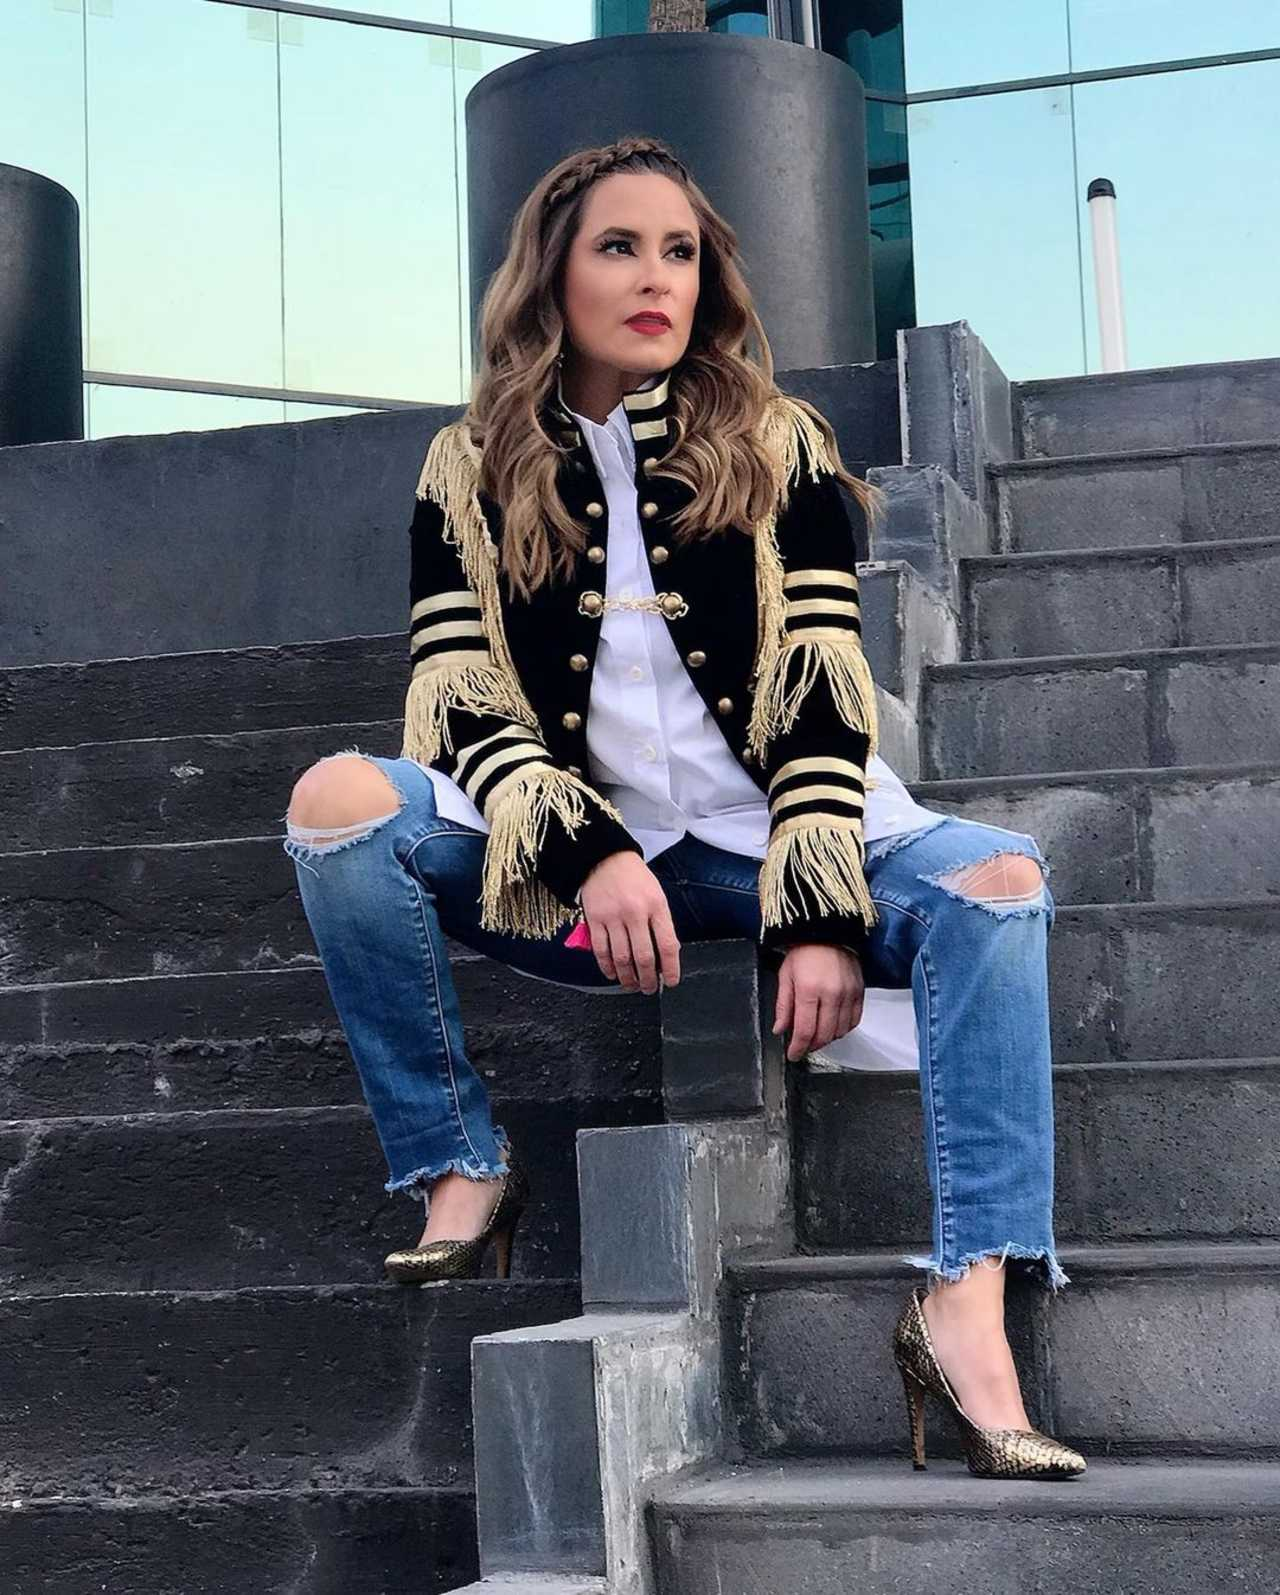 Linet Puente Camila Sodi entrevista soberbia groserías